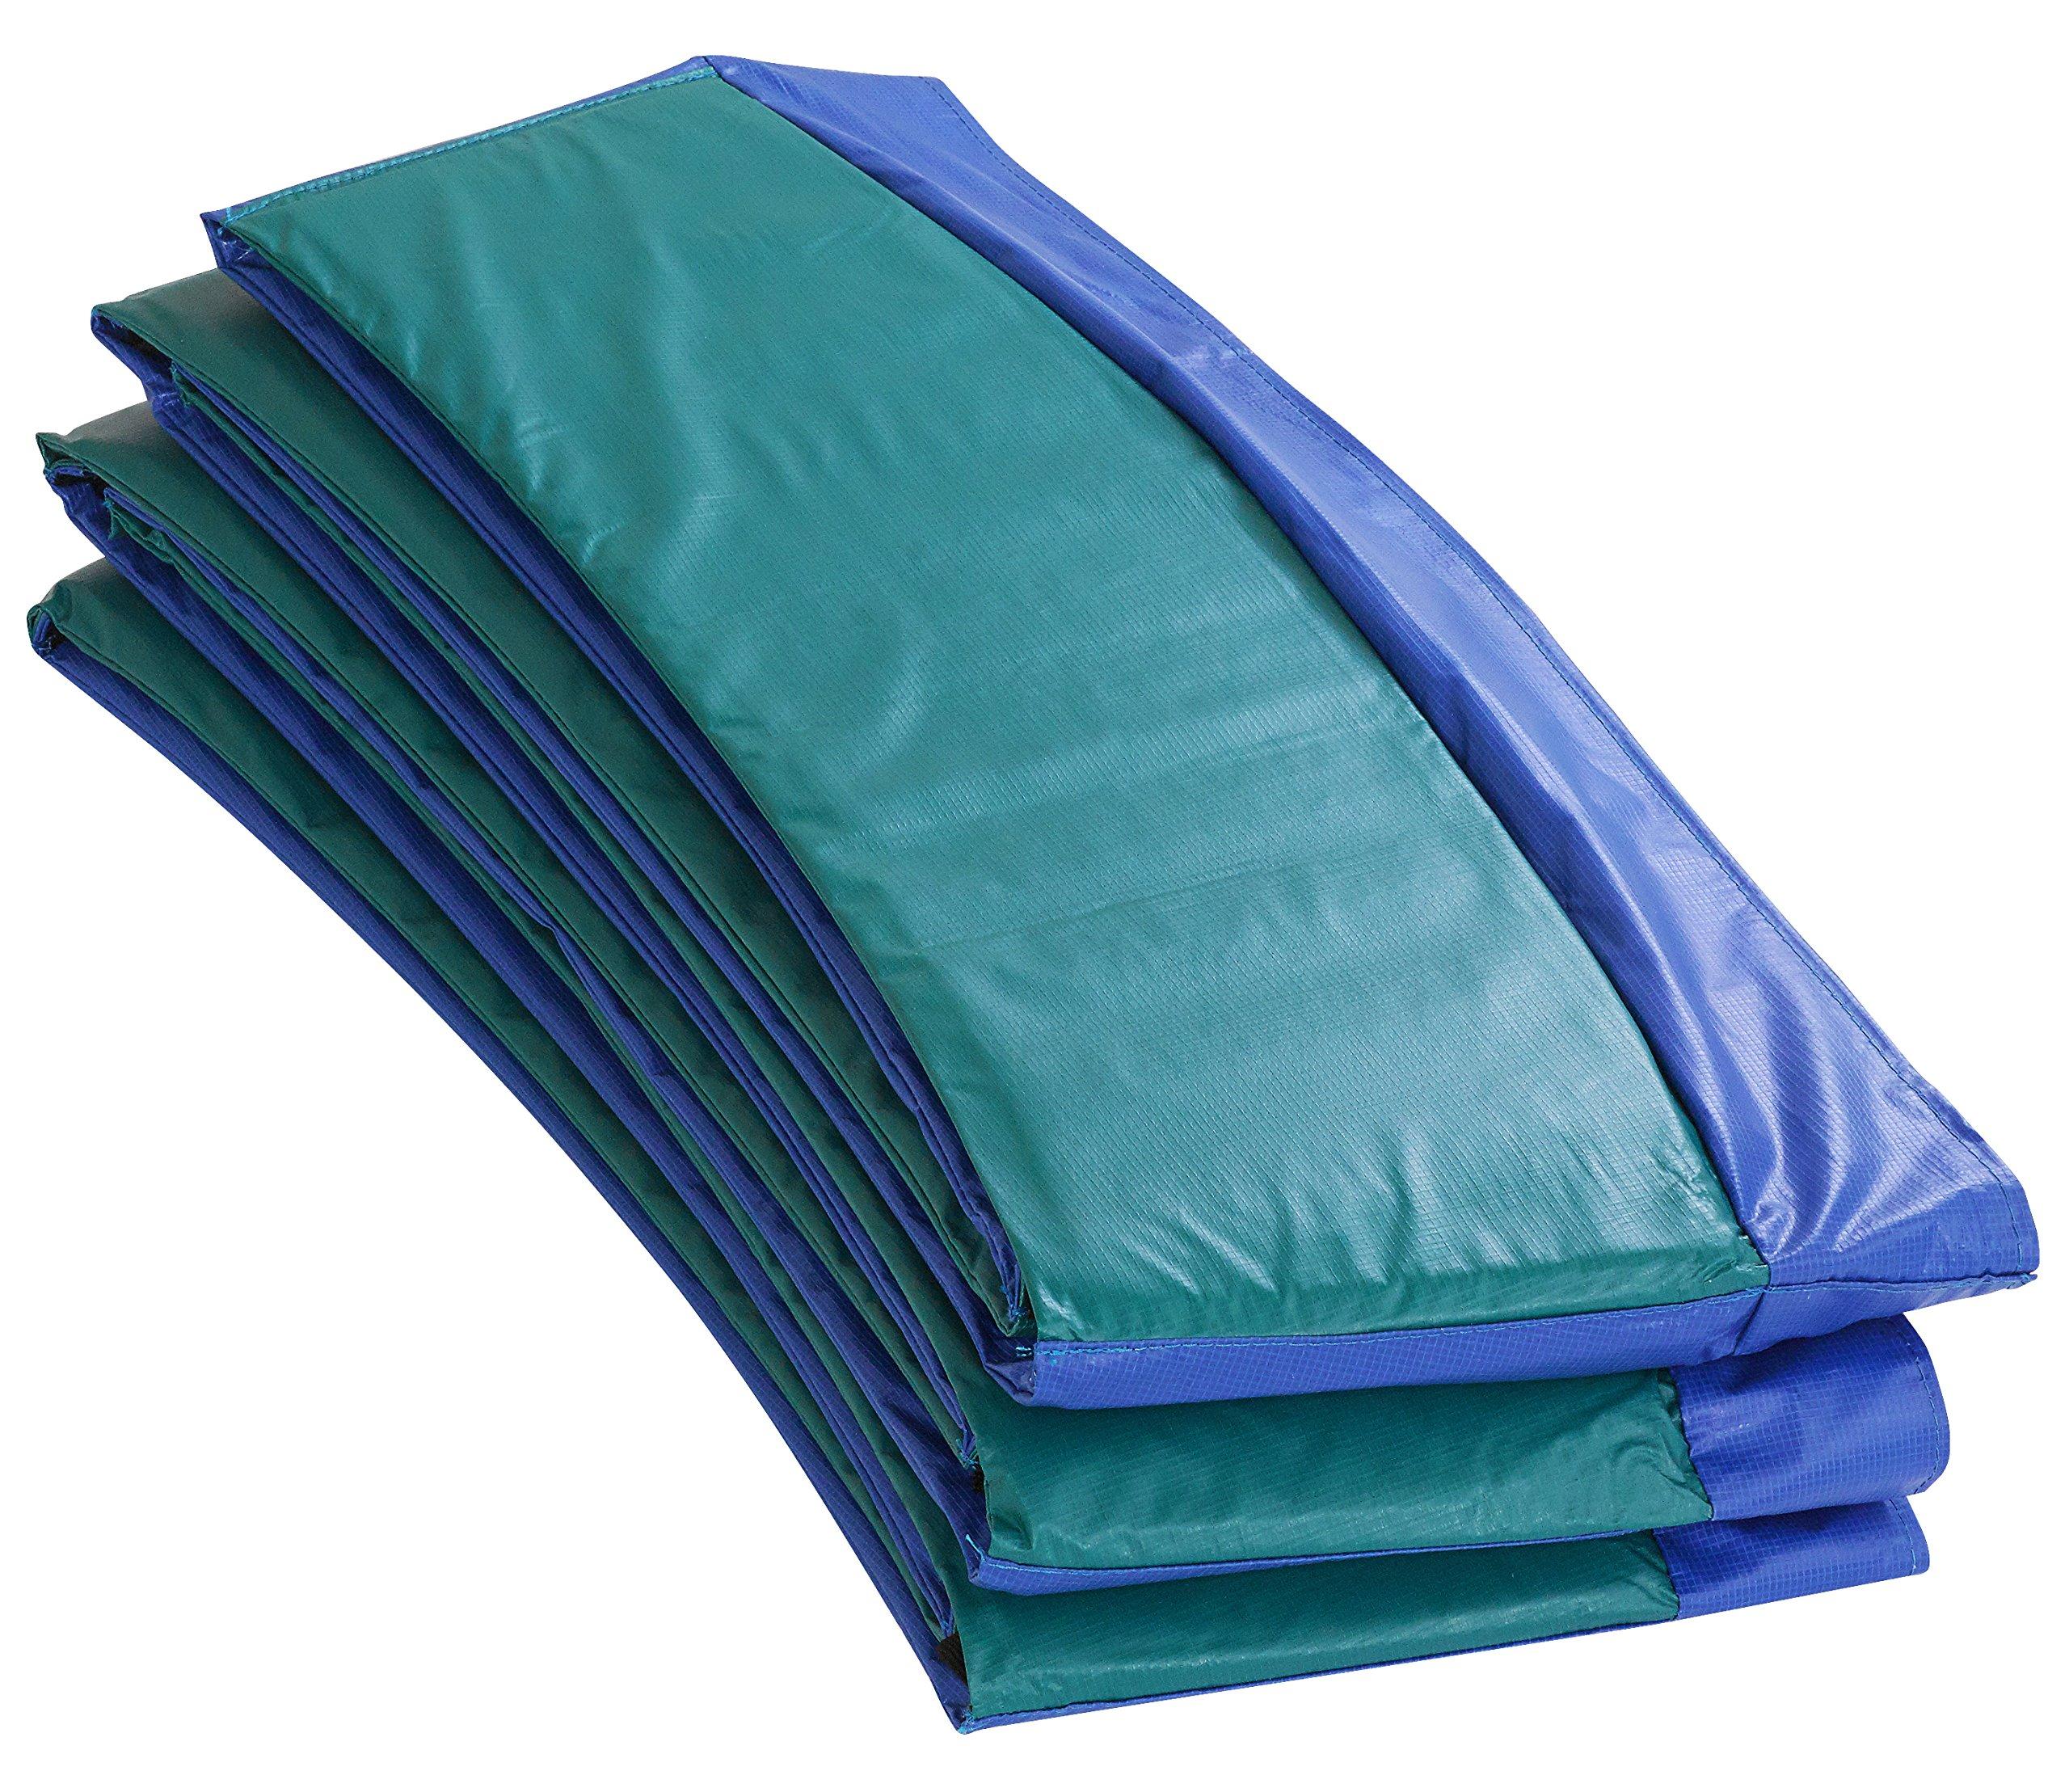 Upper Bounce Super Trampoline Safety Pad, 12-Feet, Blue/Green